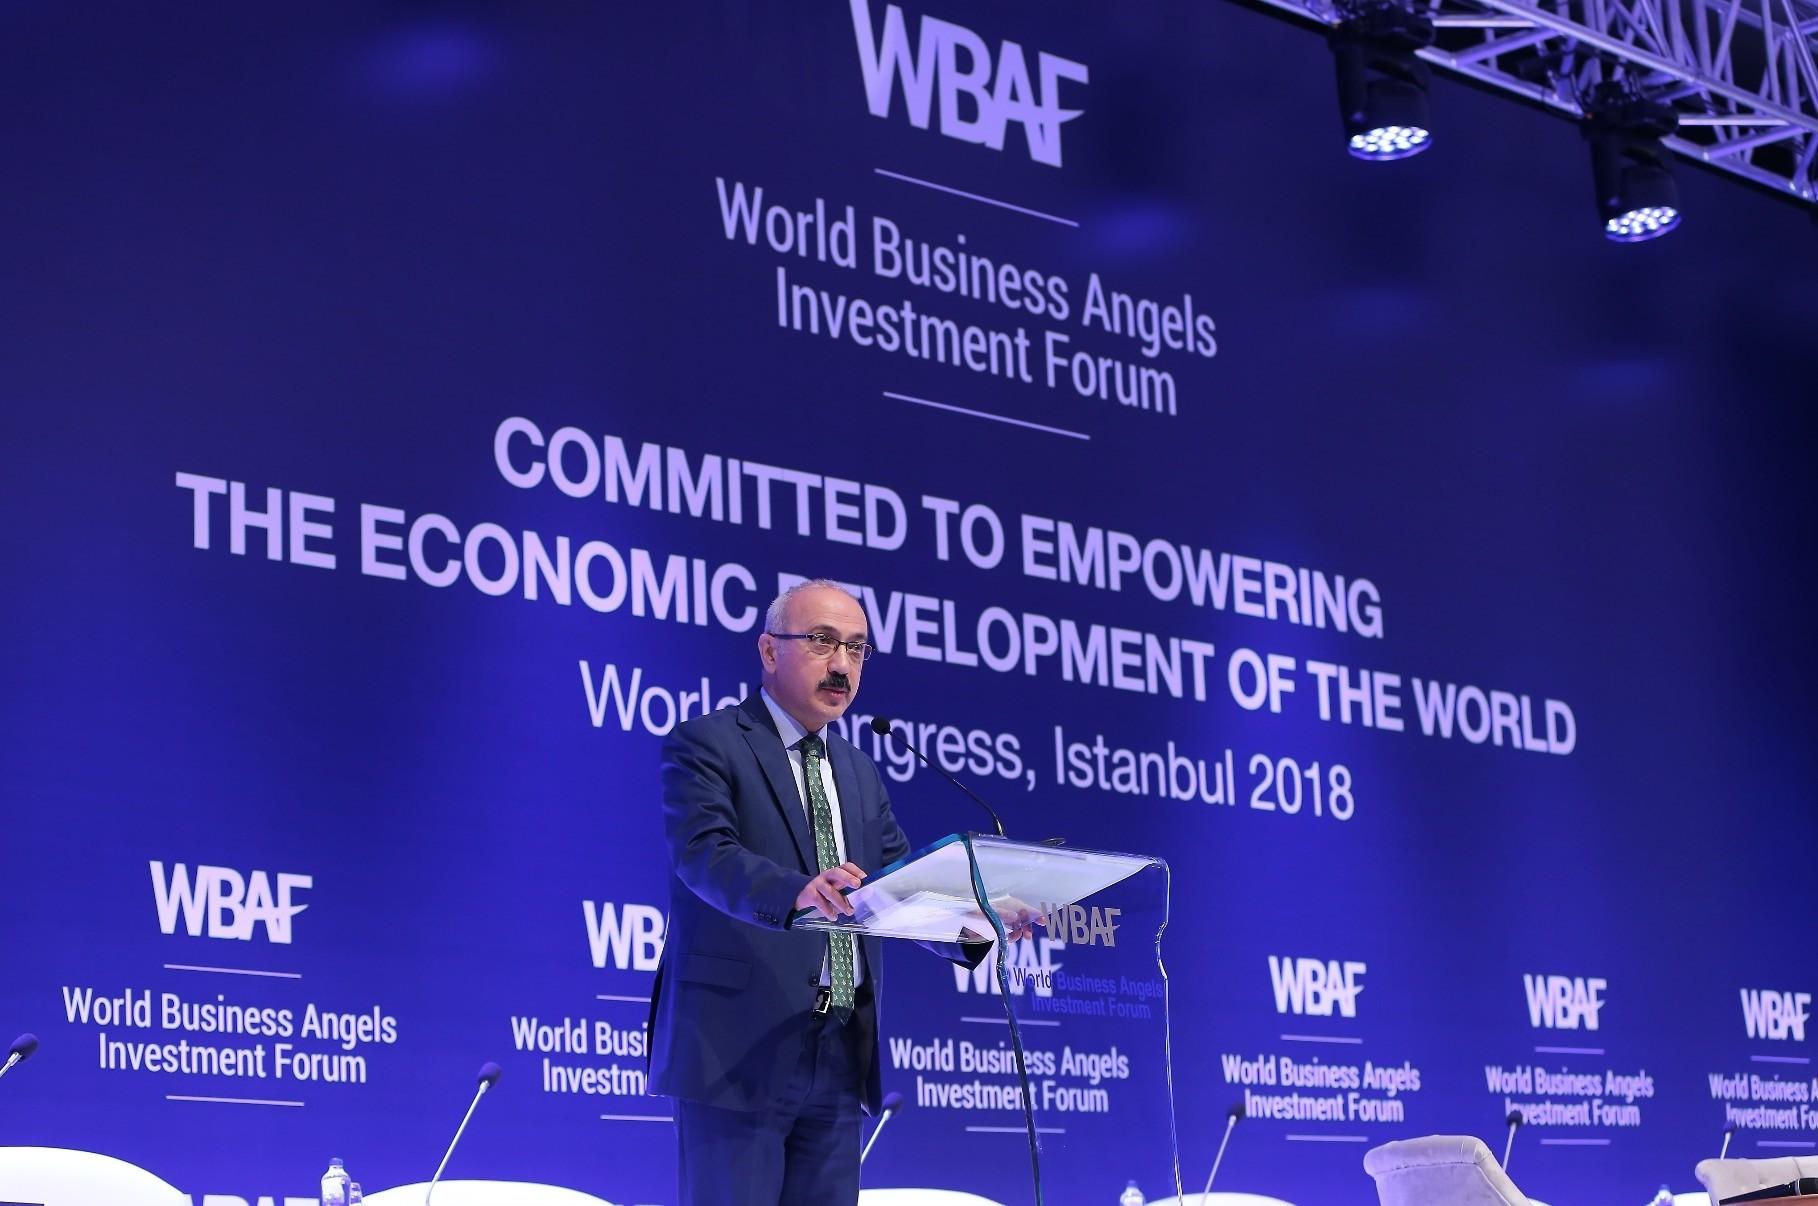 Development Minister Elvan speaks at the World Business Angels Investment Forum, Istanbul, Feb. 19.